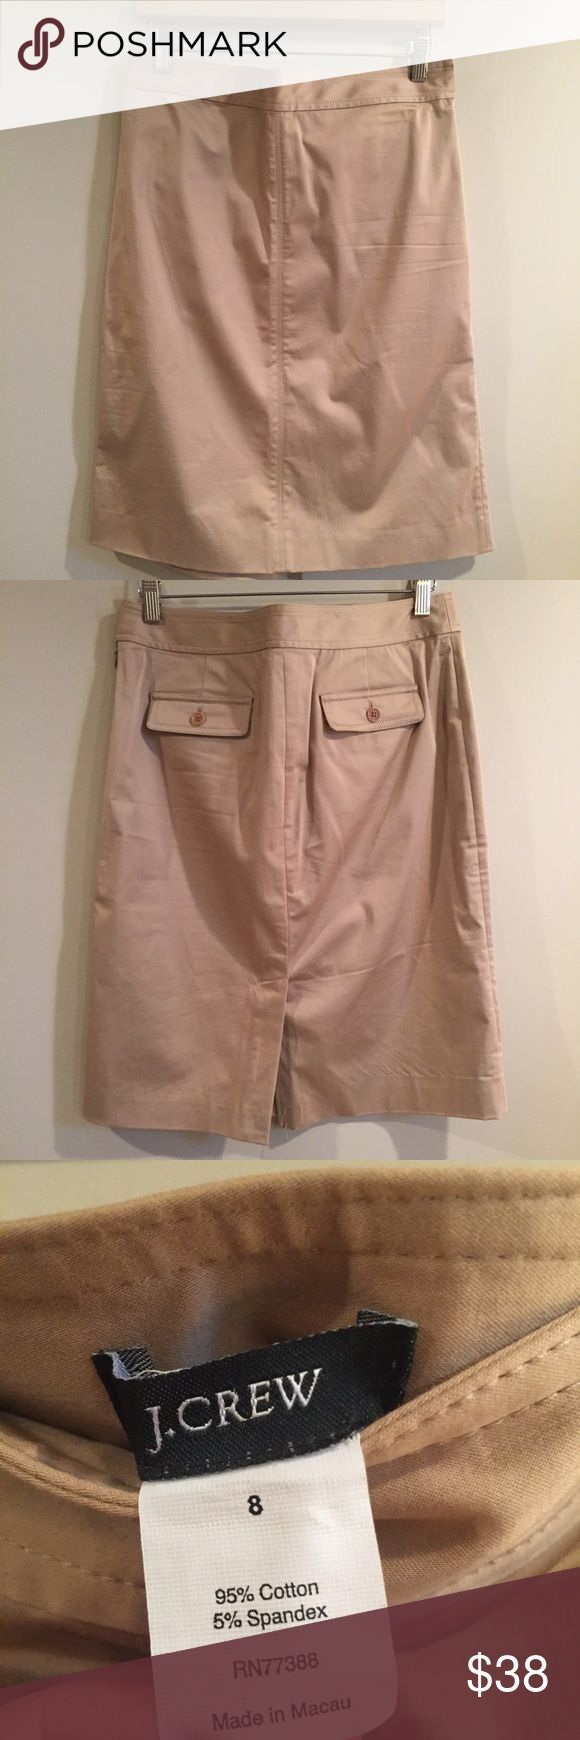 J. Crew Pocket Double Serge Cotton Pencil Skirt New Condition Khaki Pencil Skirt J. Crew Skirts Pencil